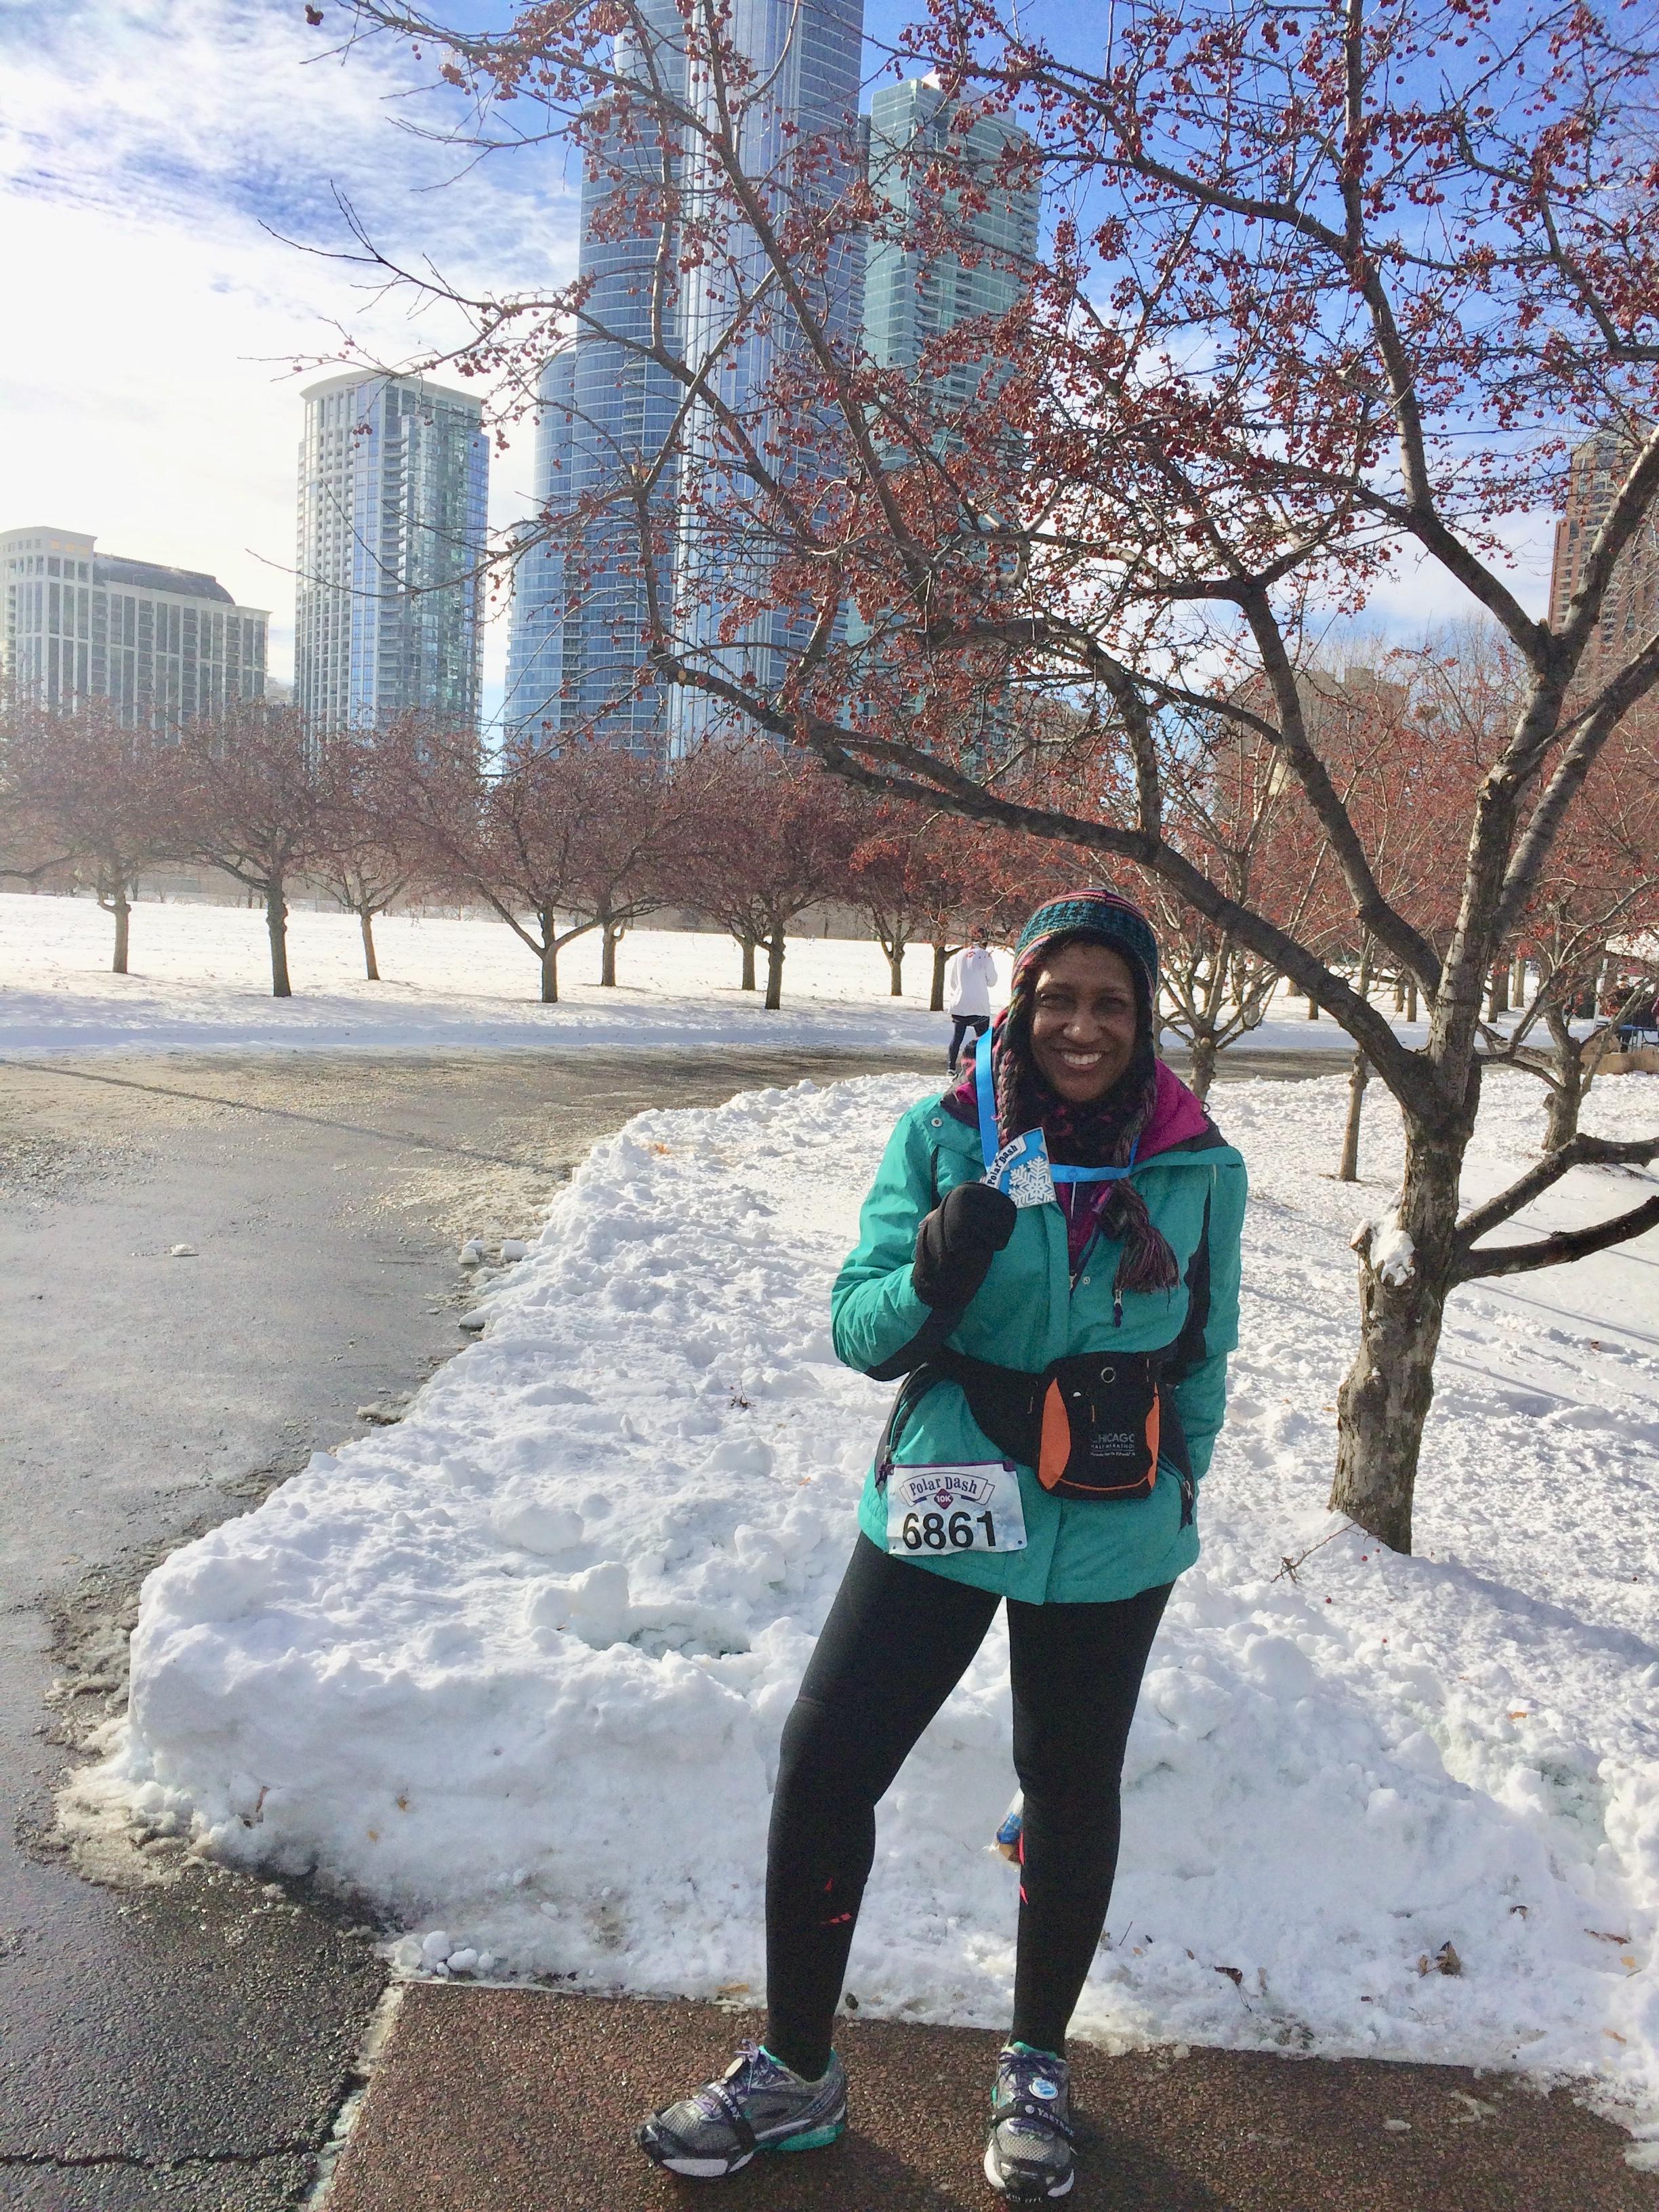 Rachell loves to run in winter